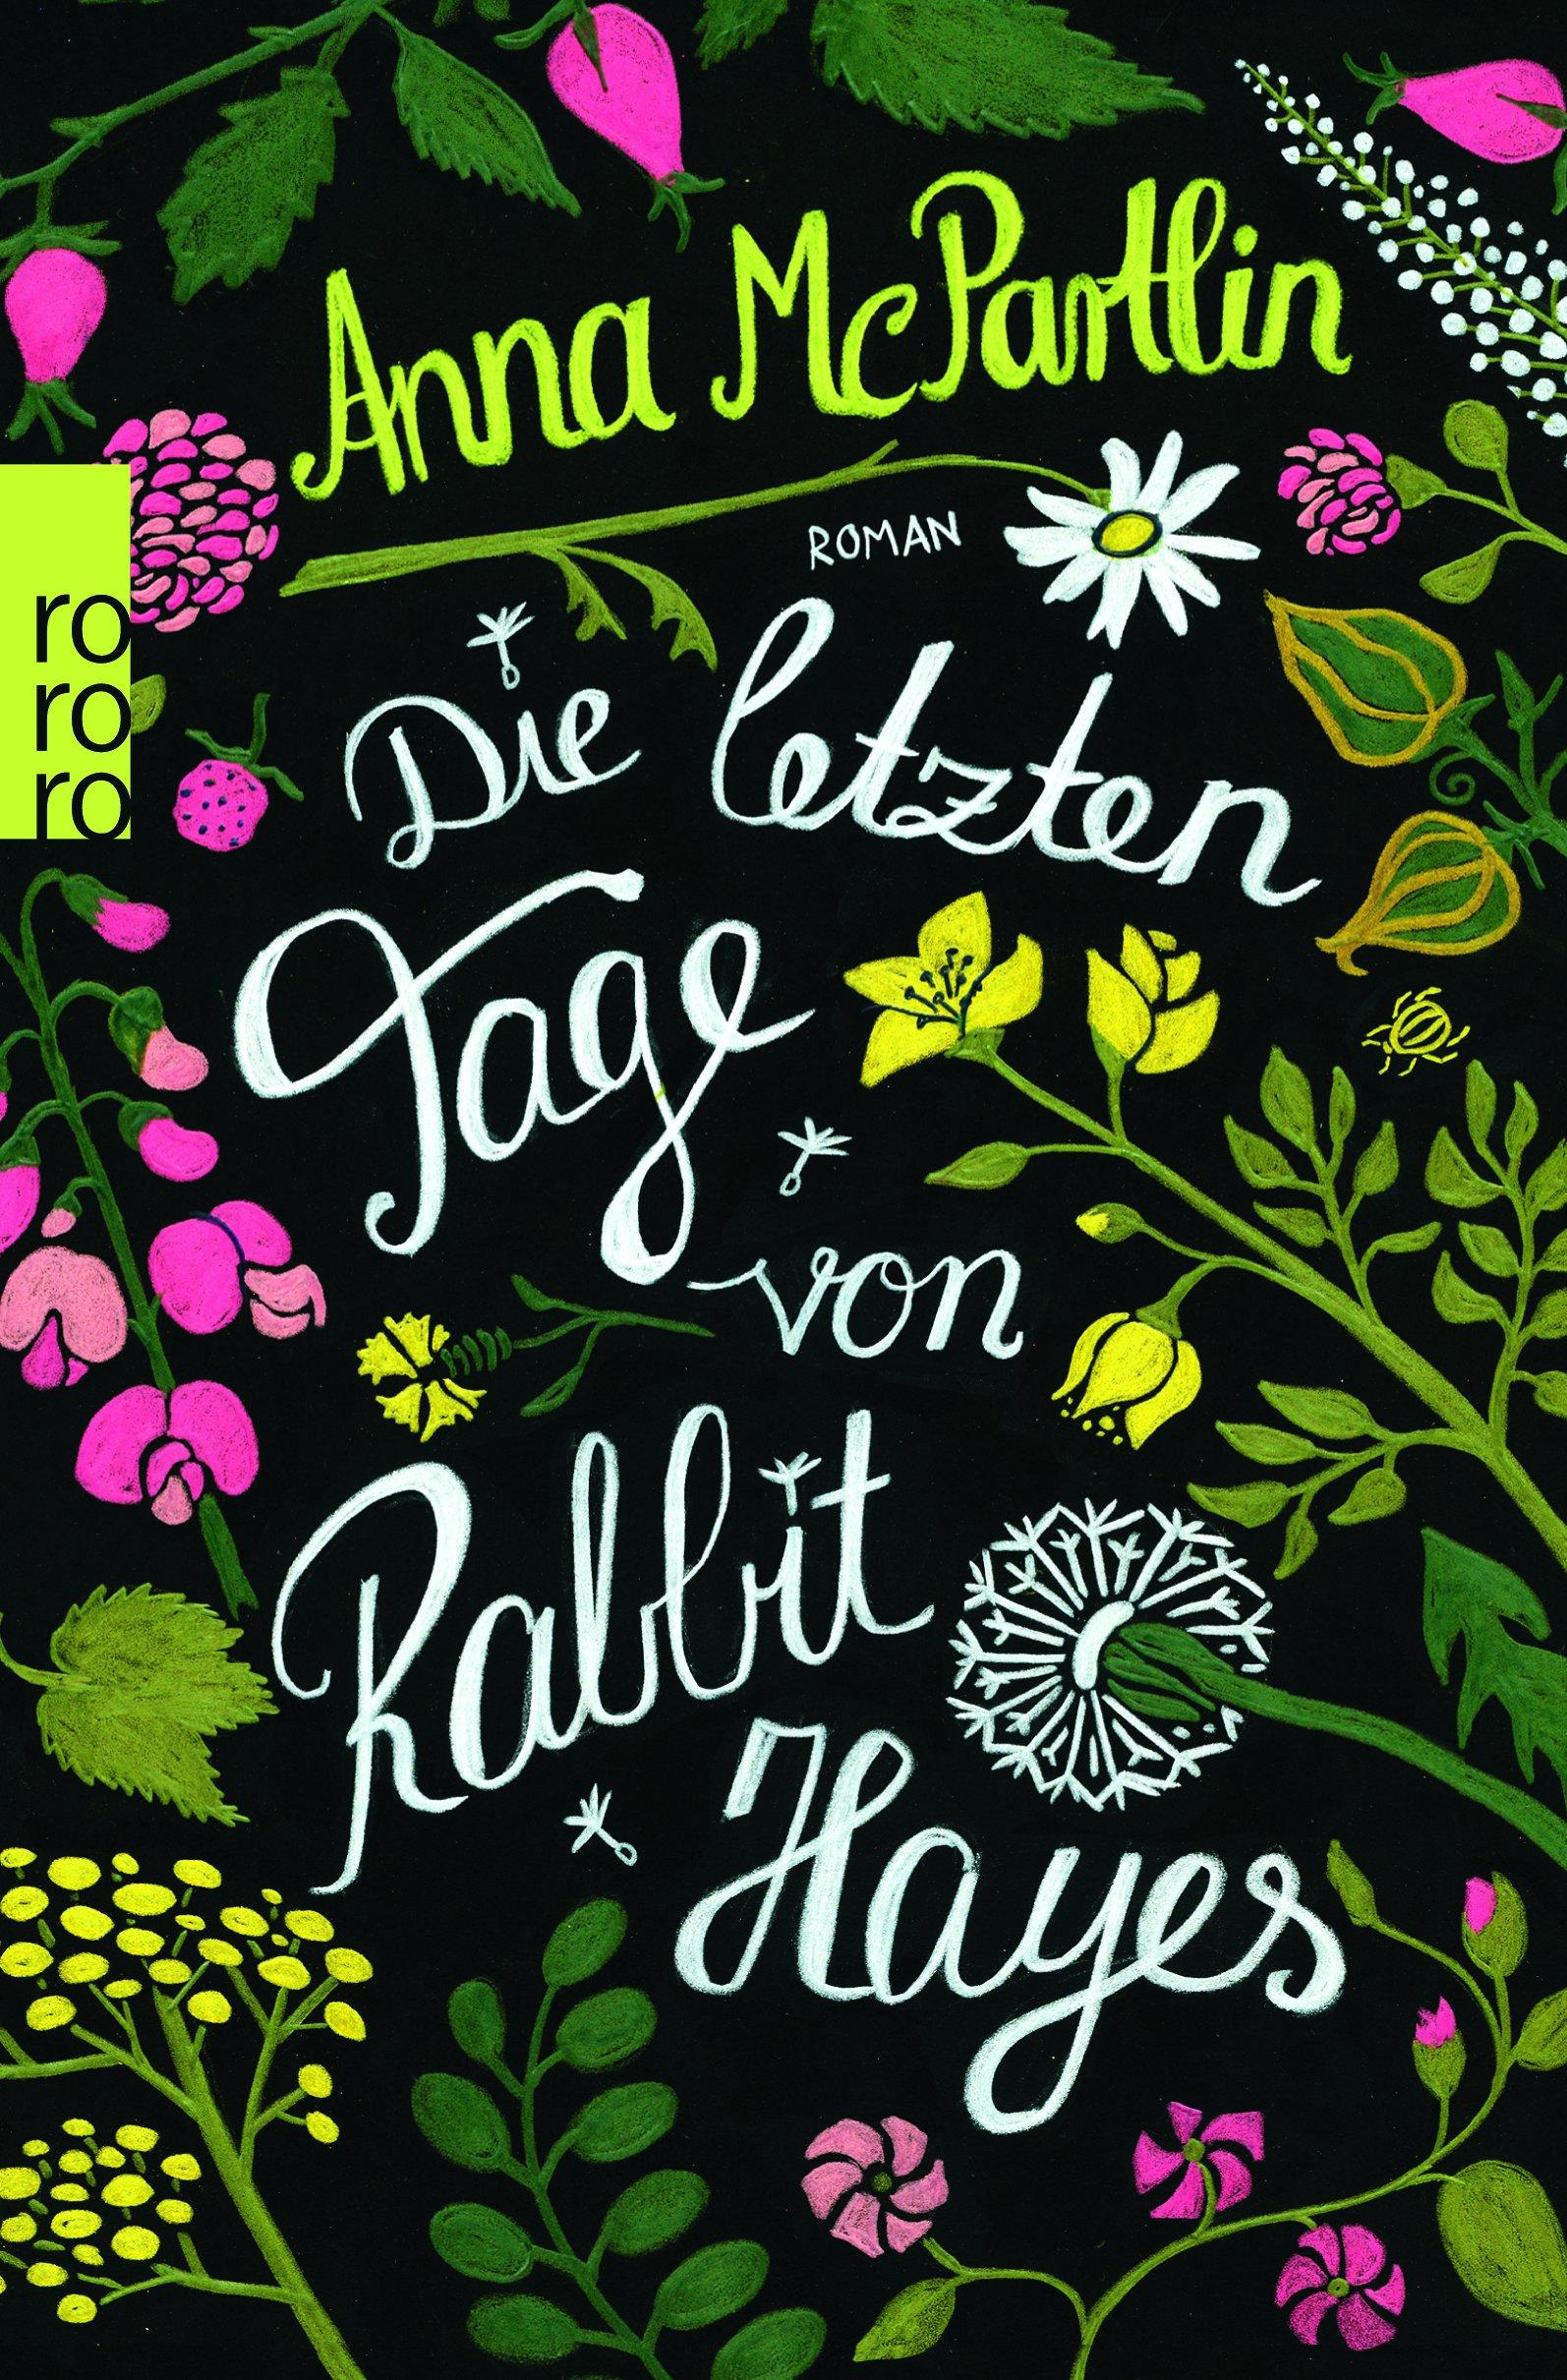 Rabbit Hayes